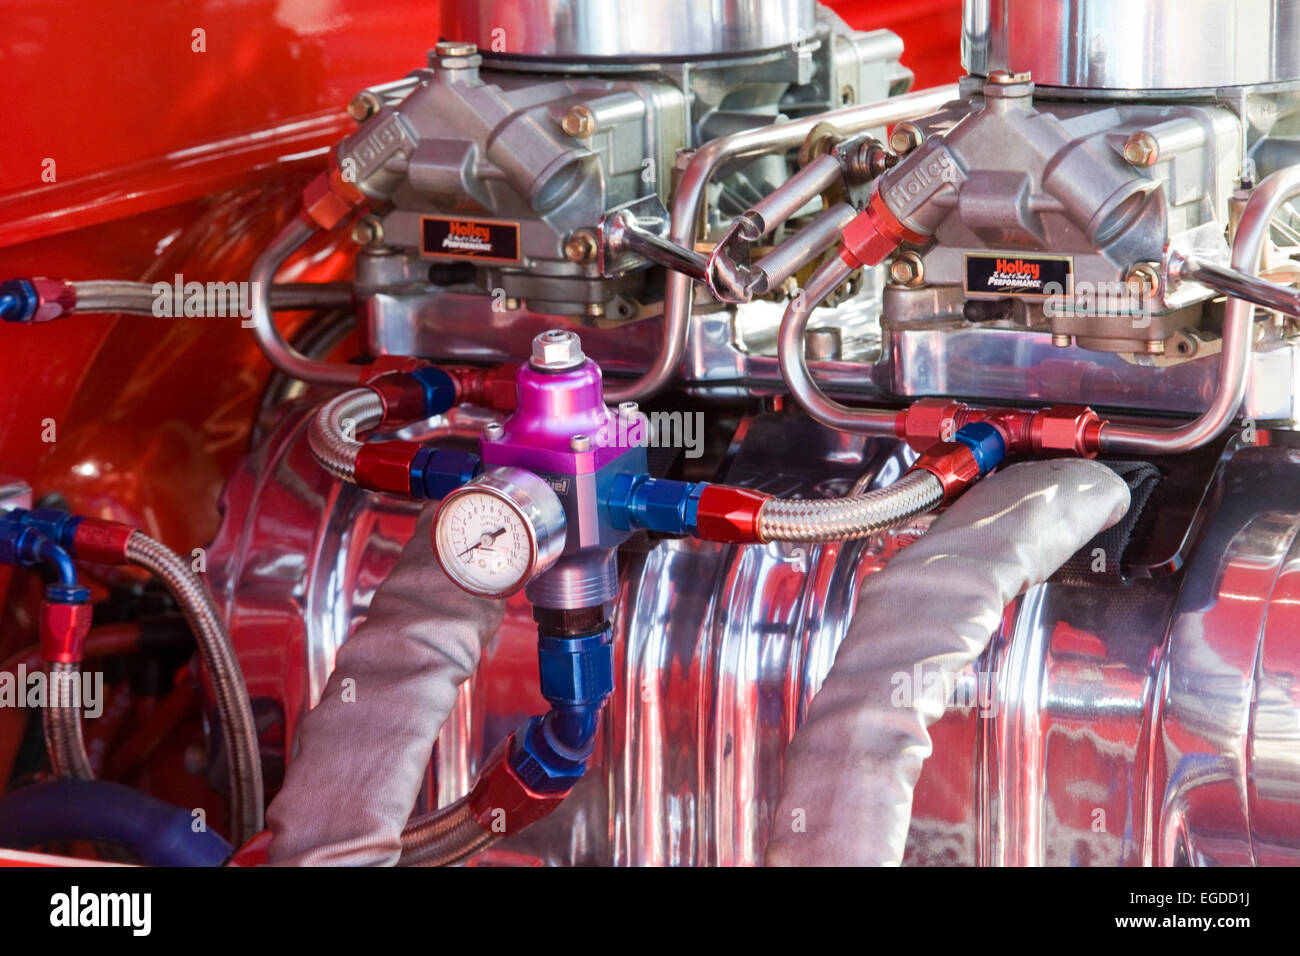 Chevy 350 Engine Stock Photos & Chevy 350 Engine Stock